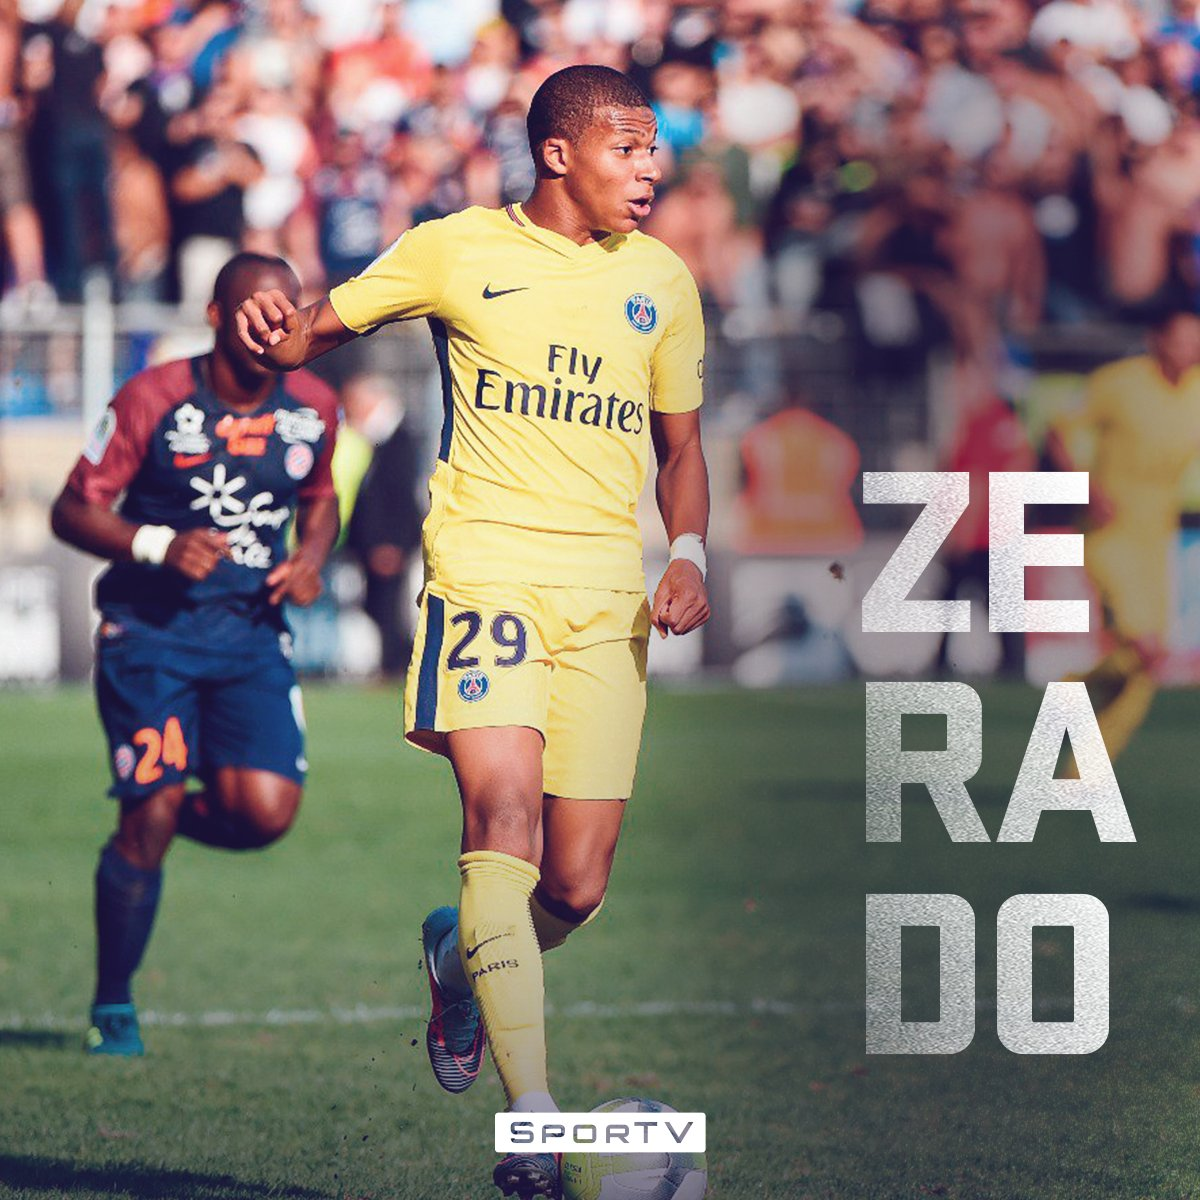 Sem Neymar